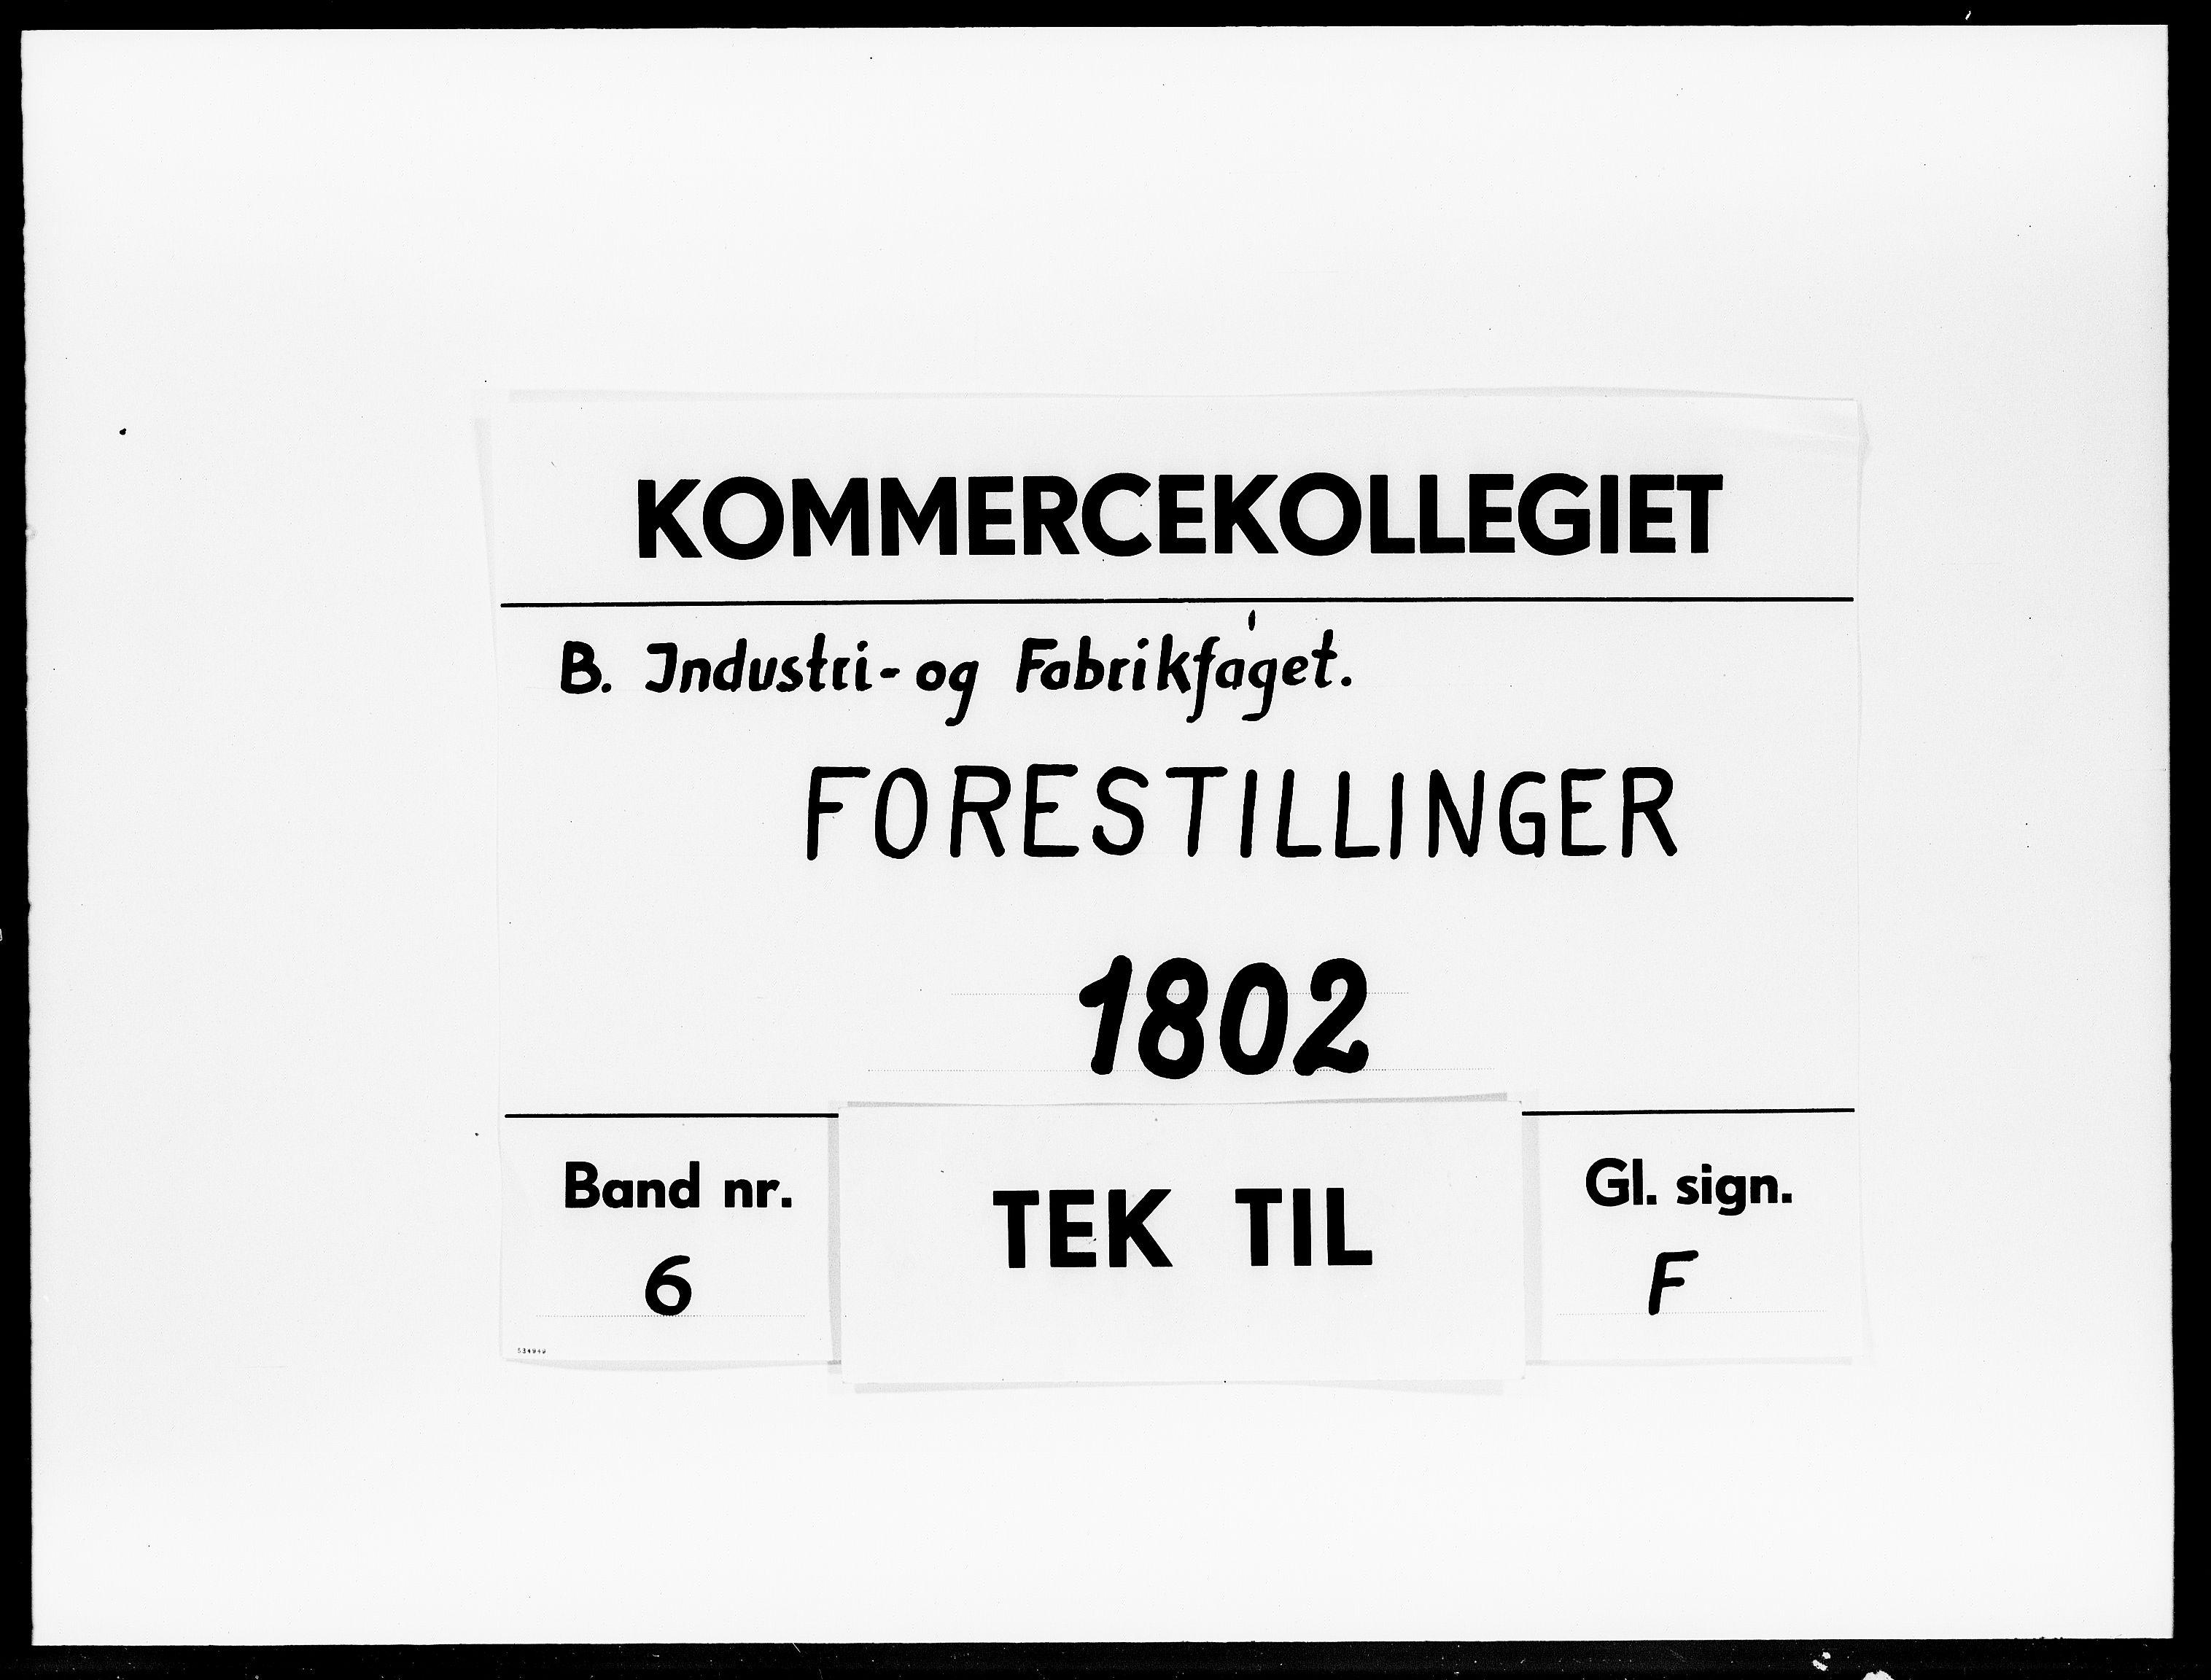 DRA, Kommercekollegiet, Industri- og Fabriksfaget, -/1342: Forestillinger, 1802